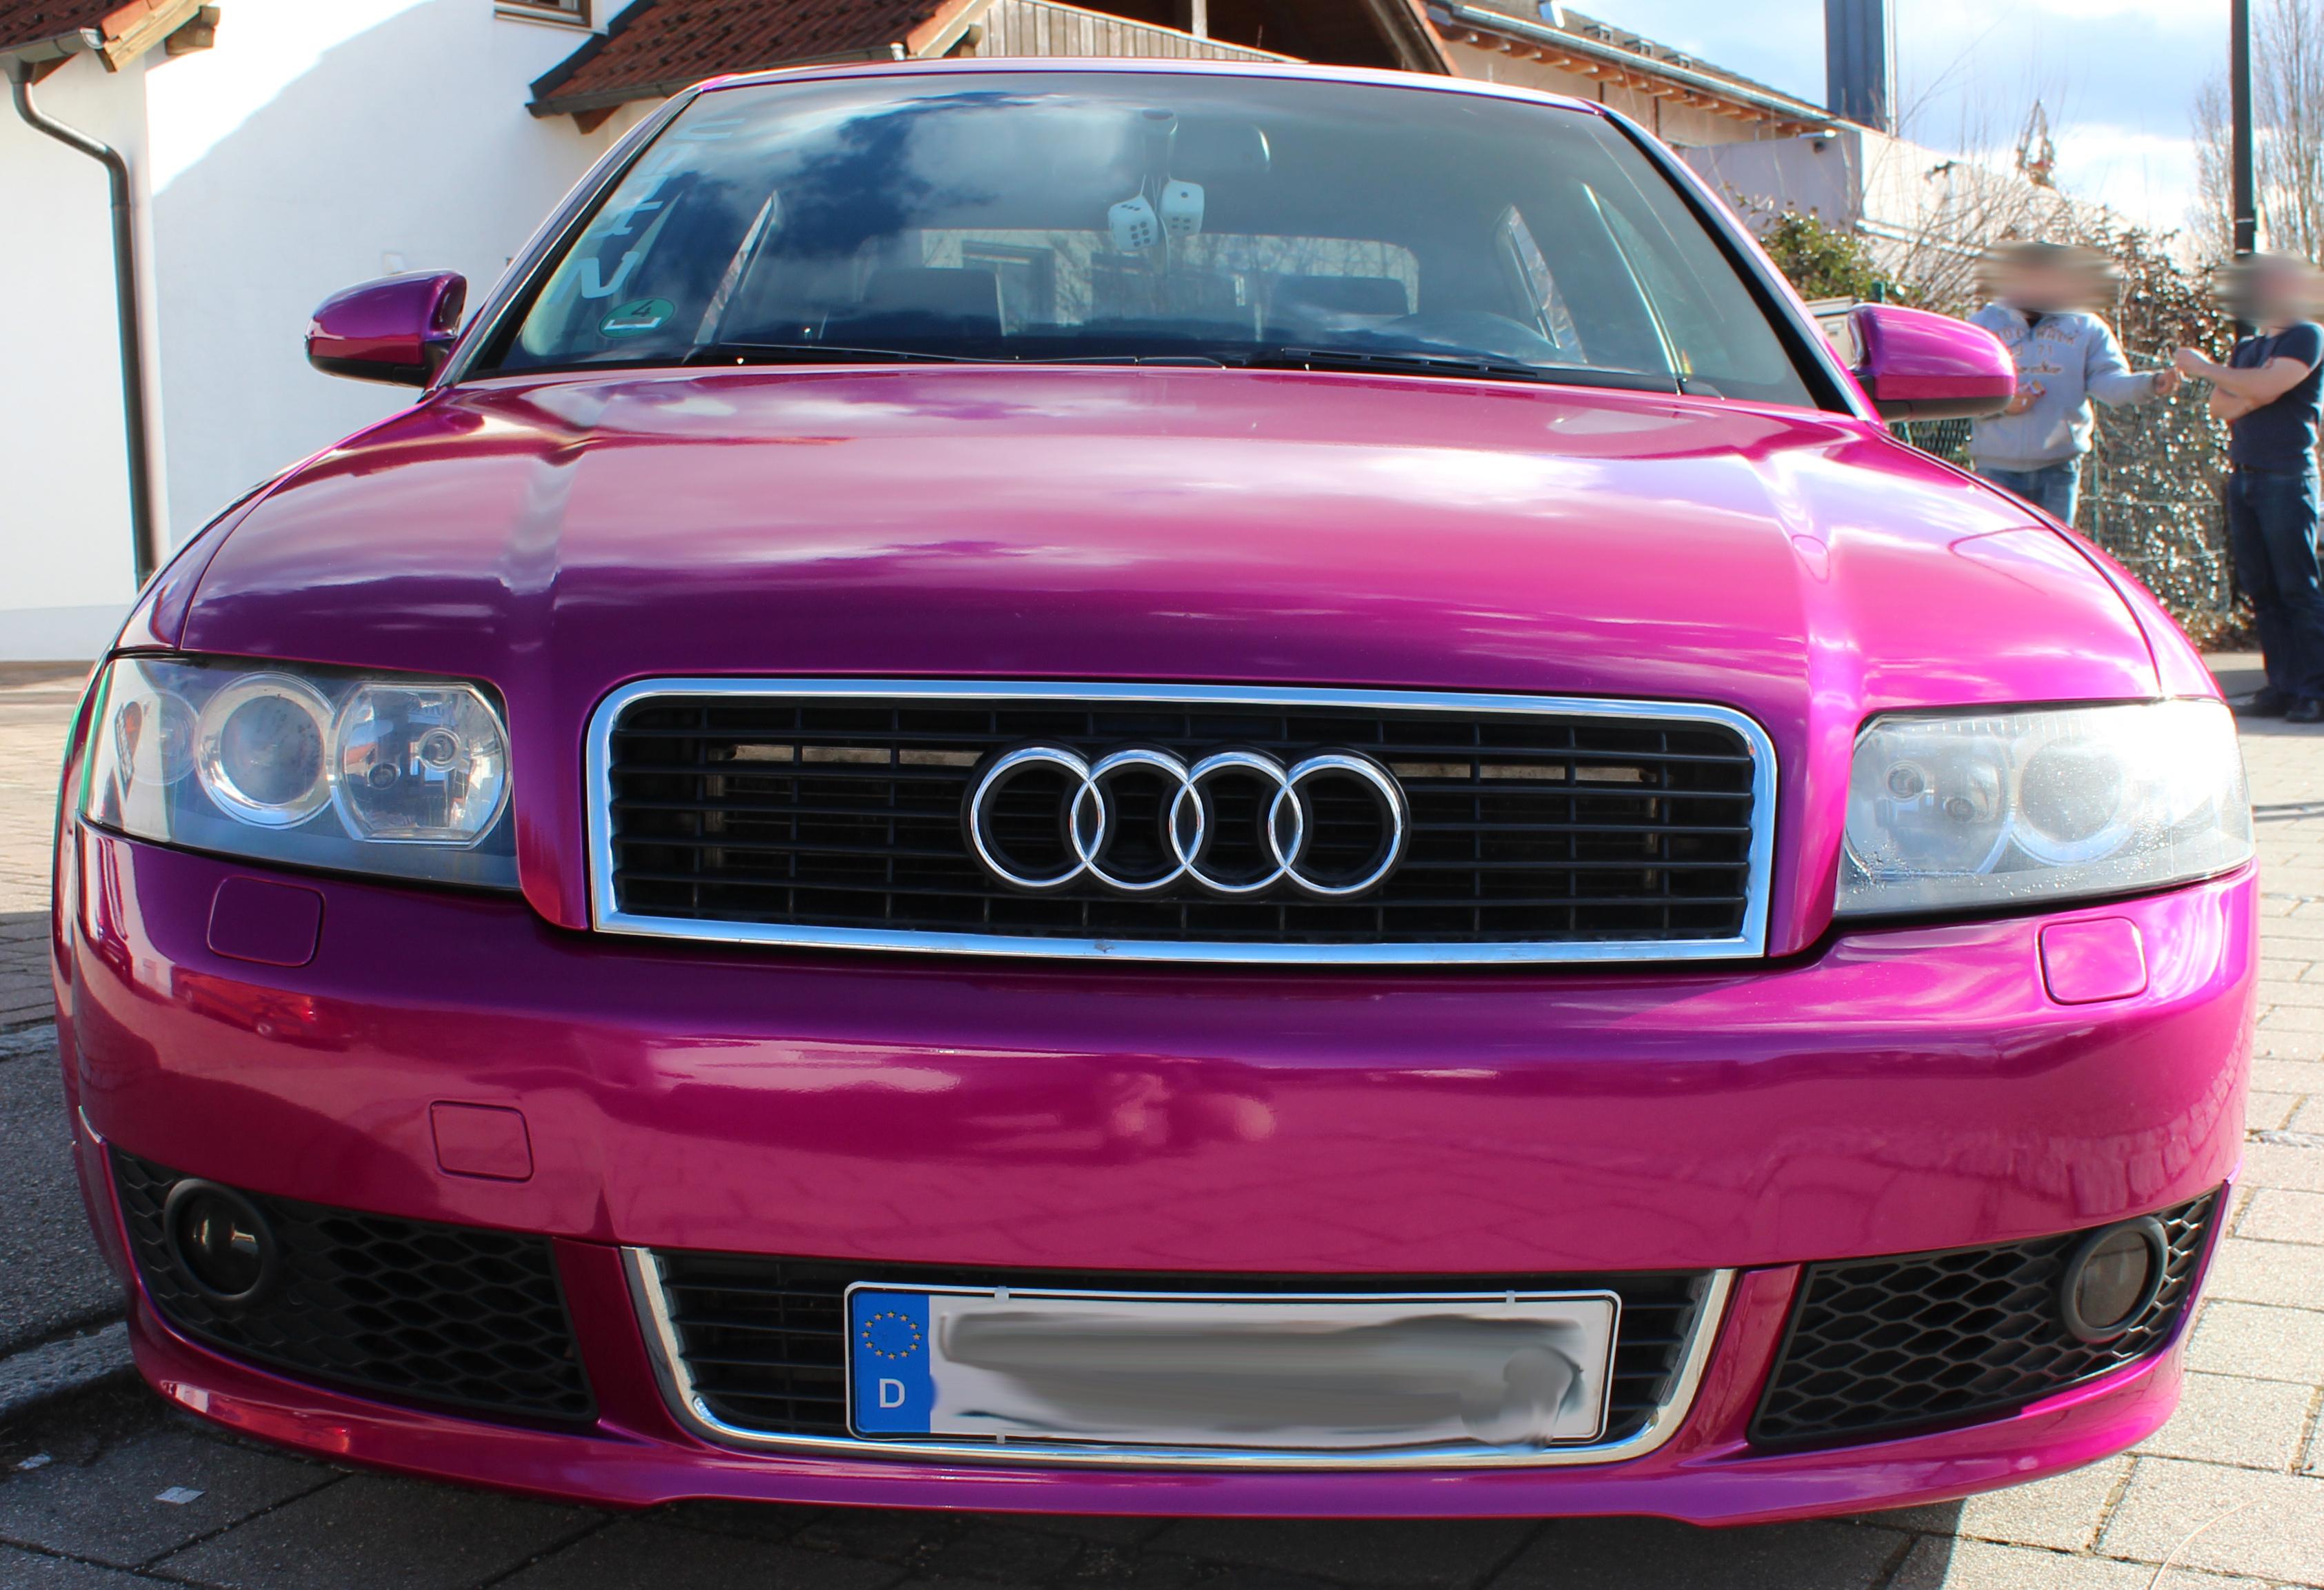 Car_Wrap_Vollflächenbeklebung_Audi_A4